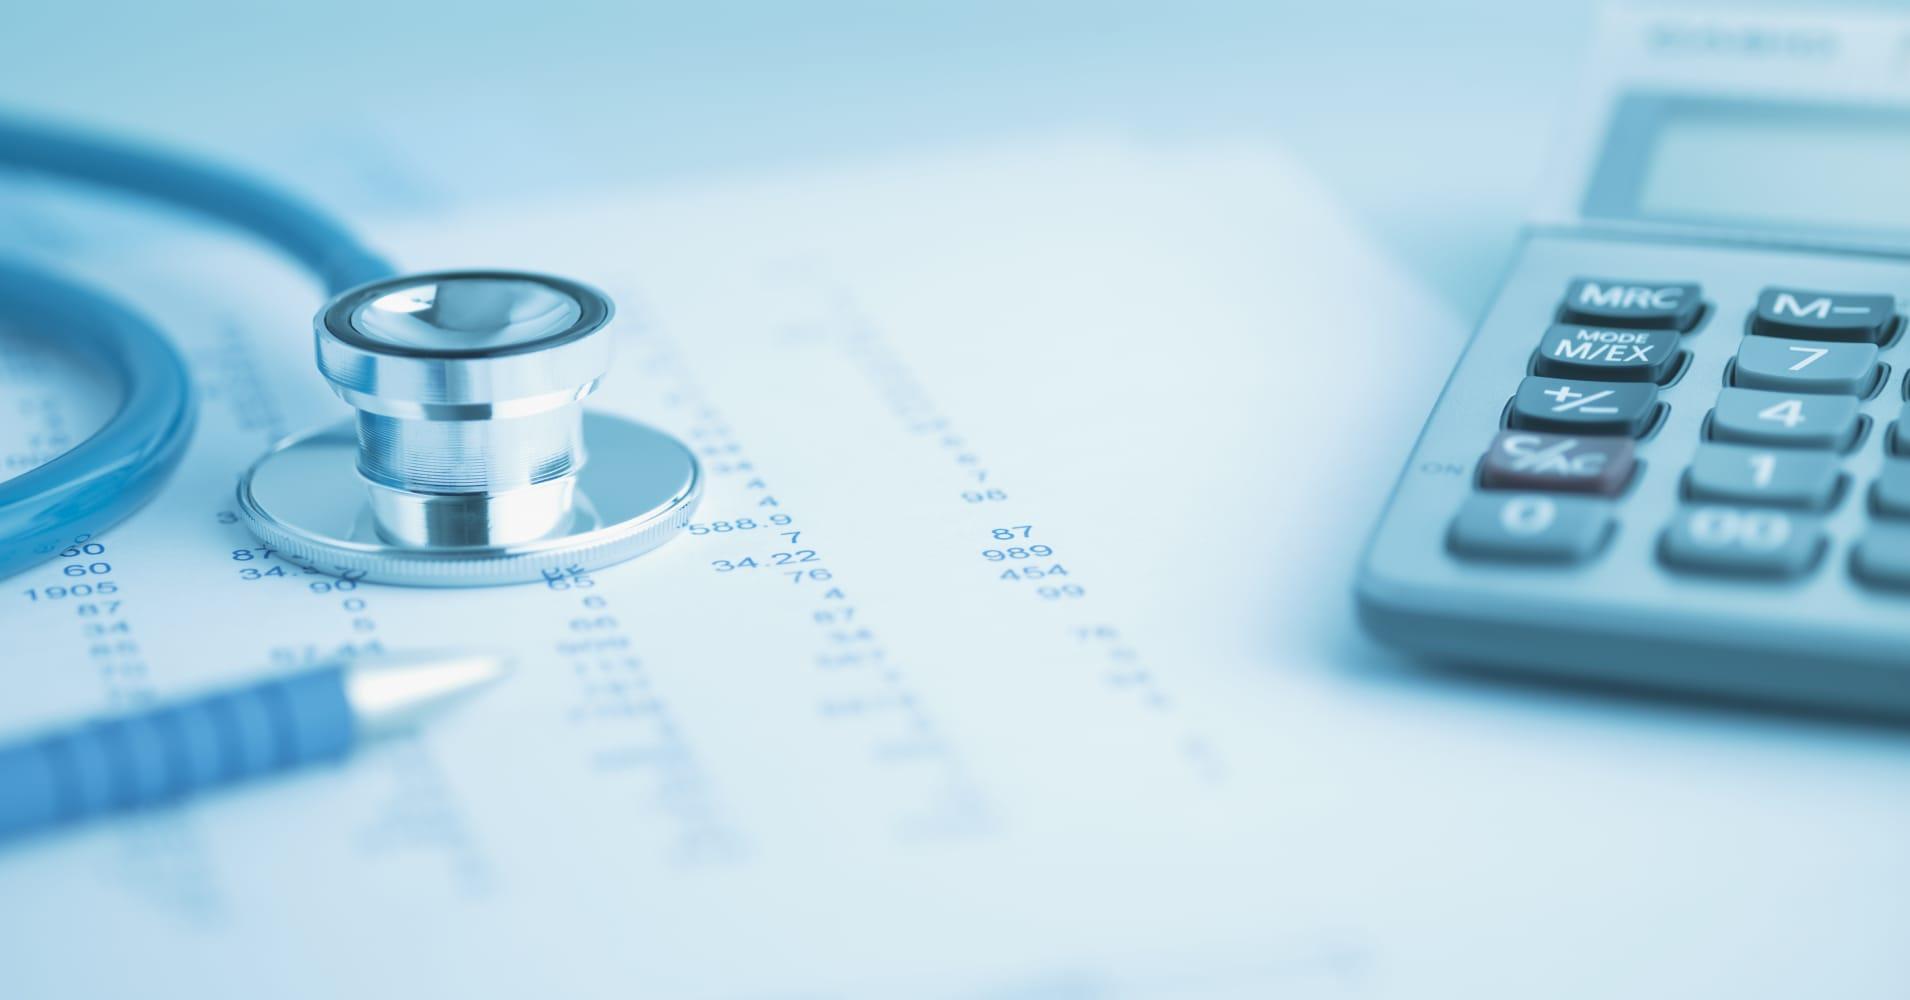 Unpaid medical bills unfairly hurt credit scores